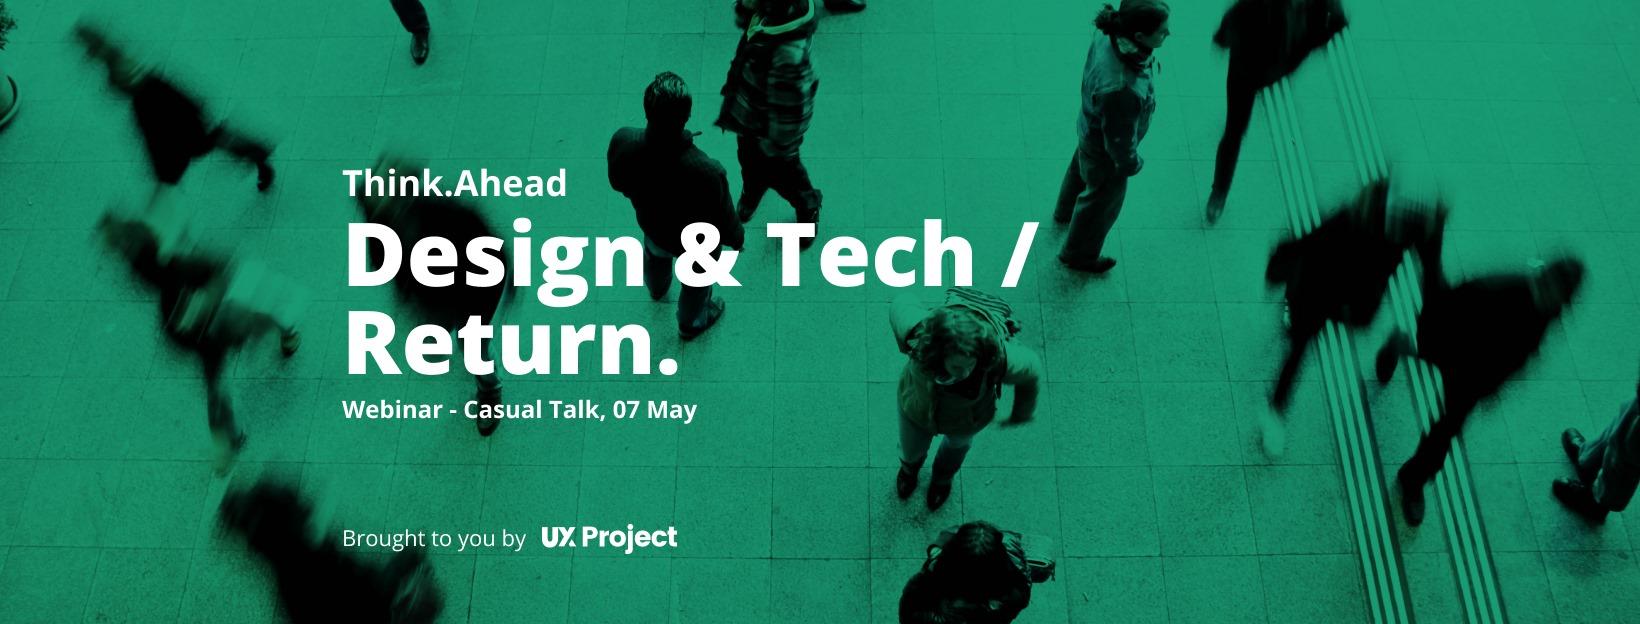 Design & Tech / Return – Think.Ahead Webinar